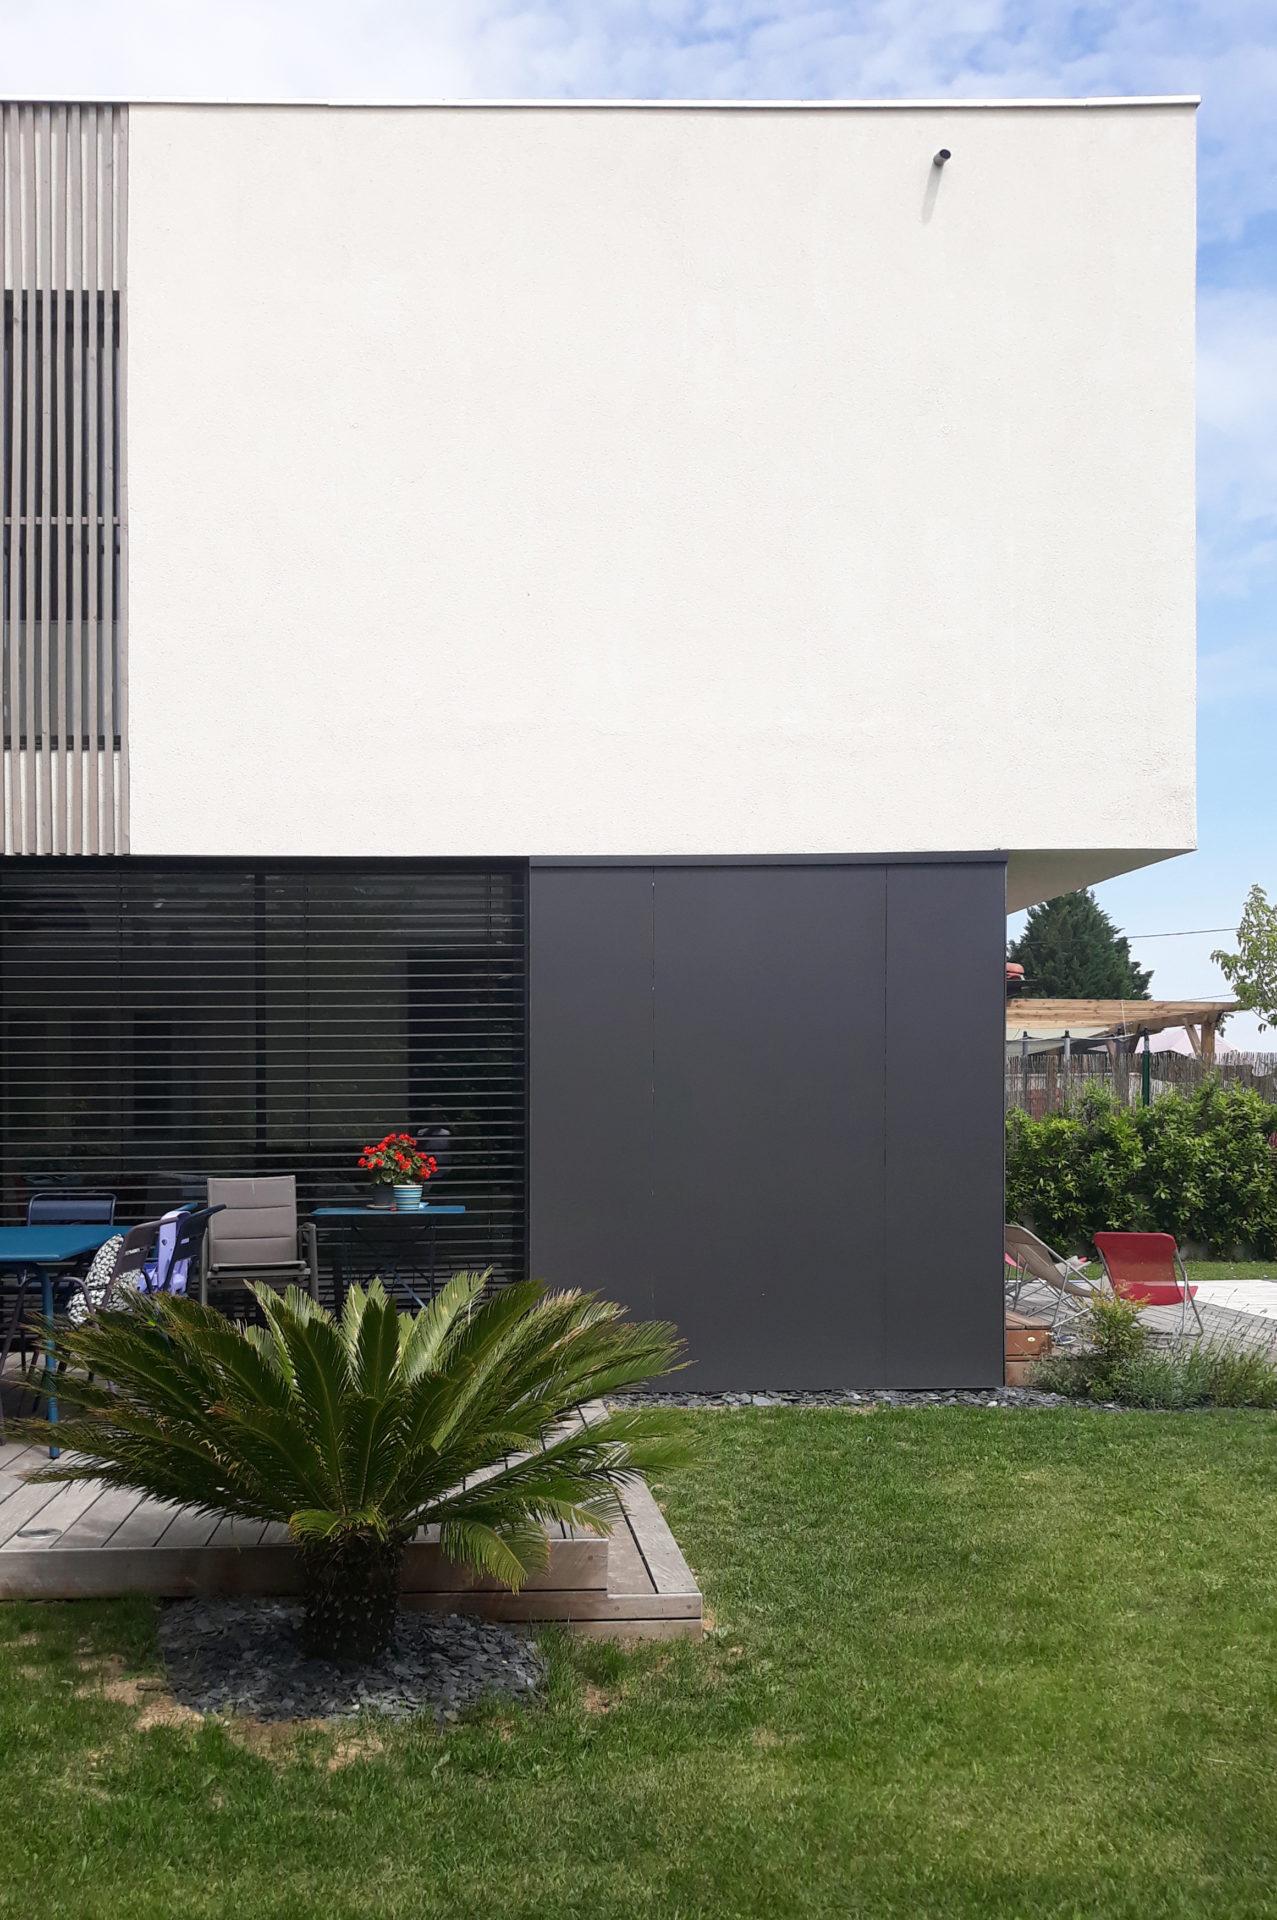 asb-architecture-maison-contemporaine-toiture-terrasse-minimaliste 4